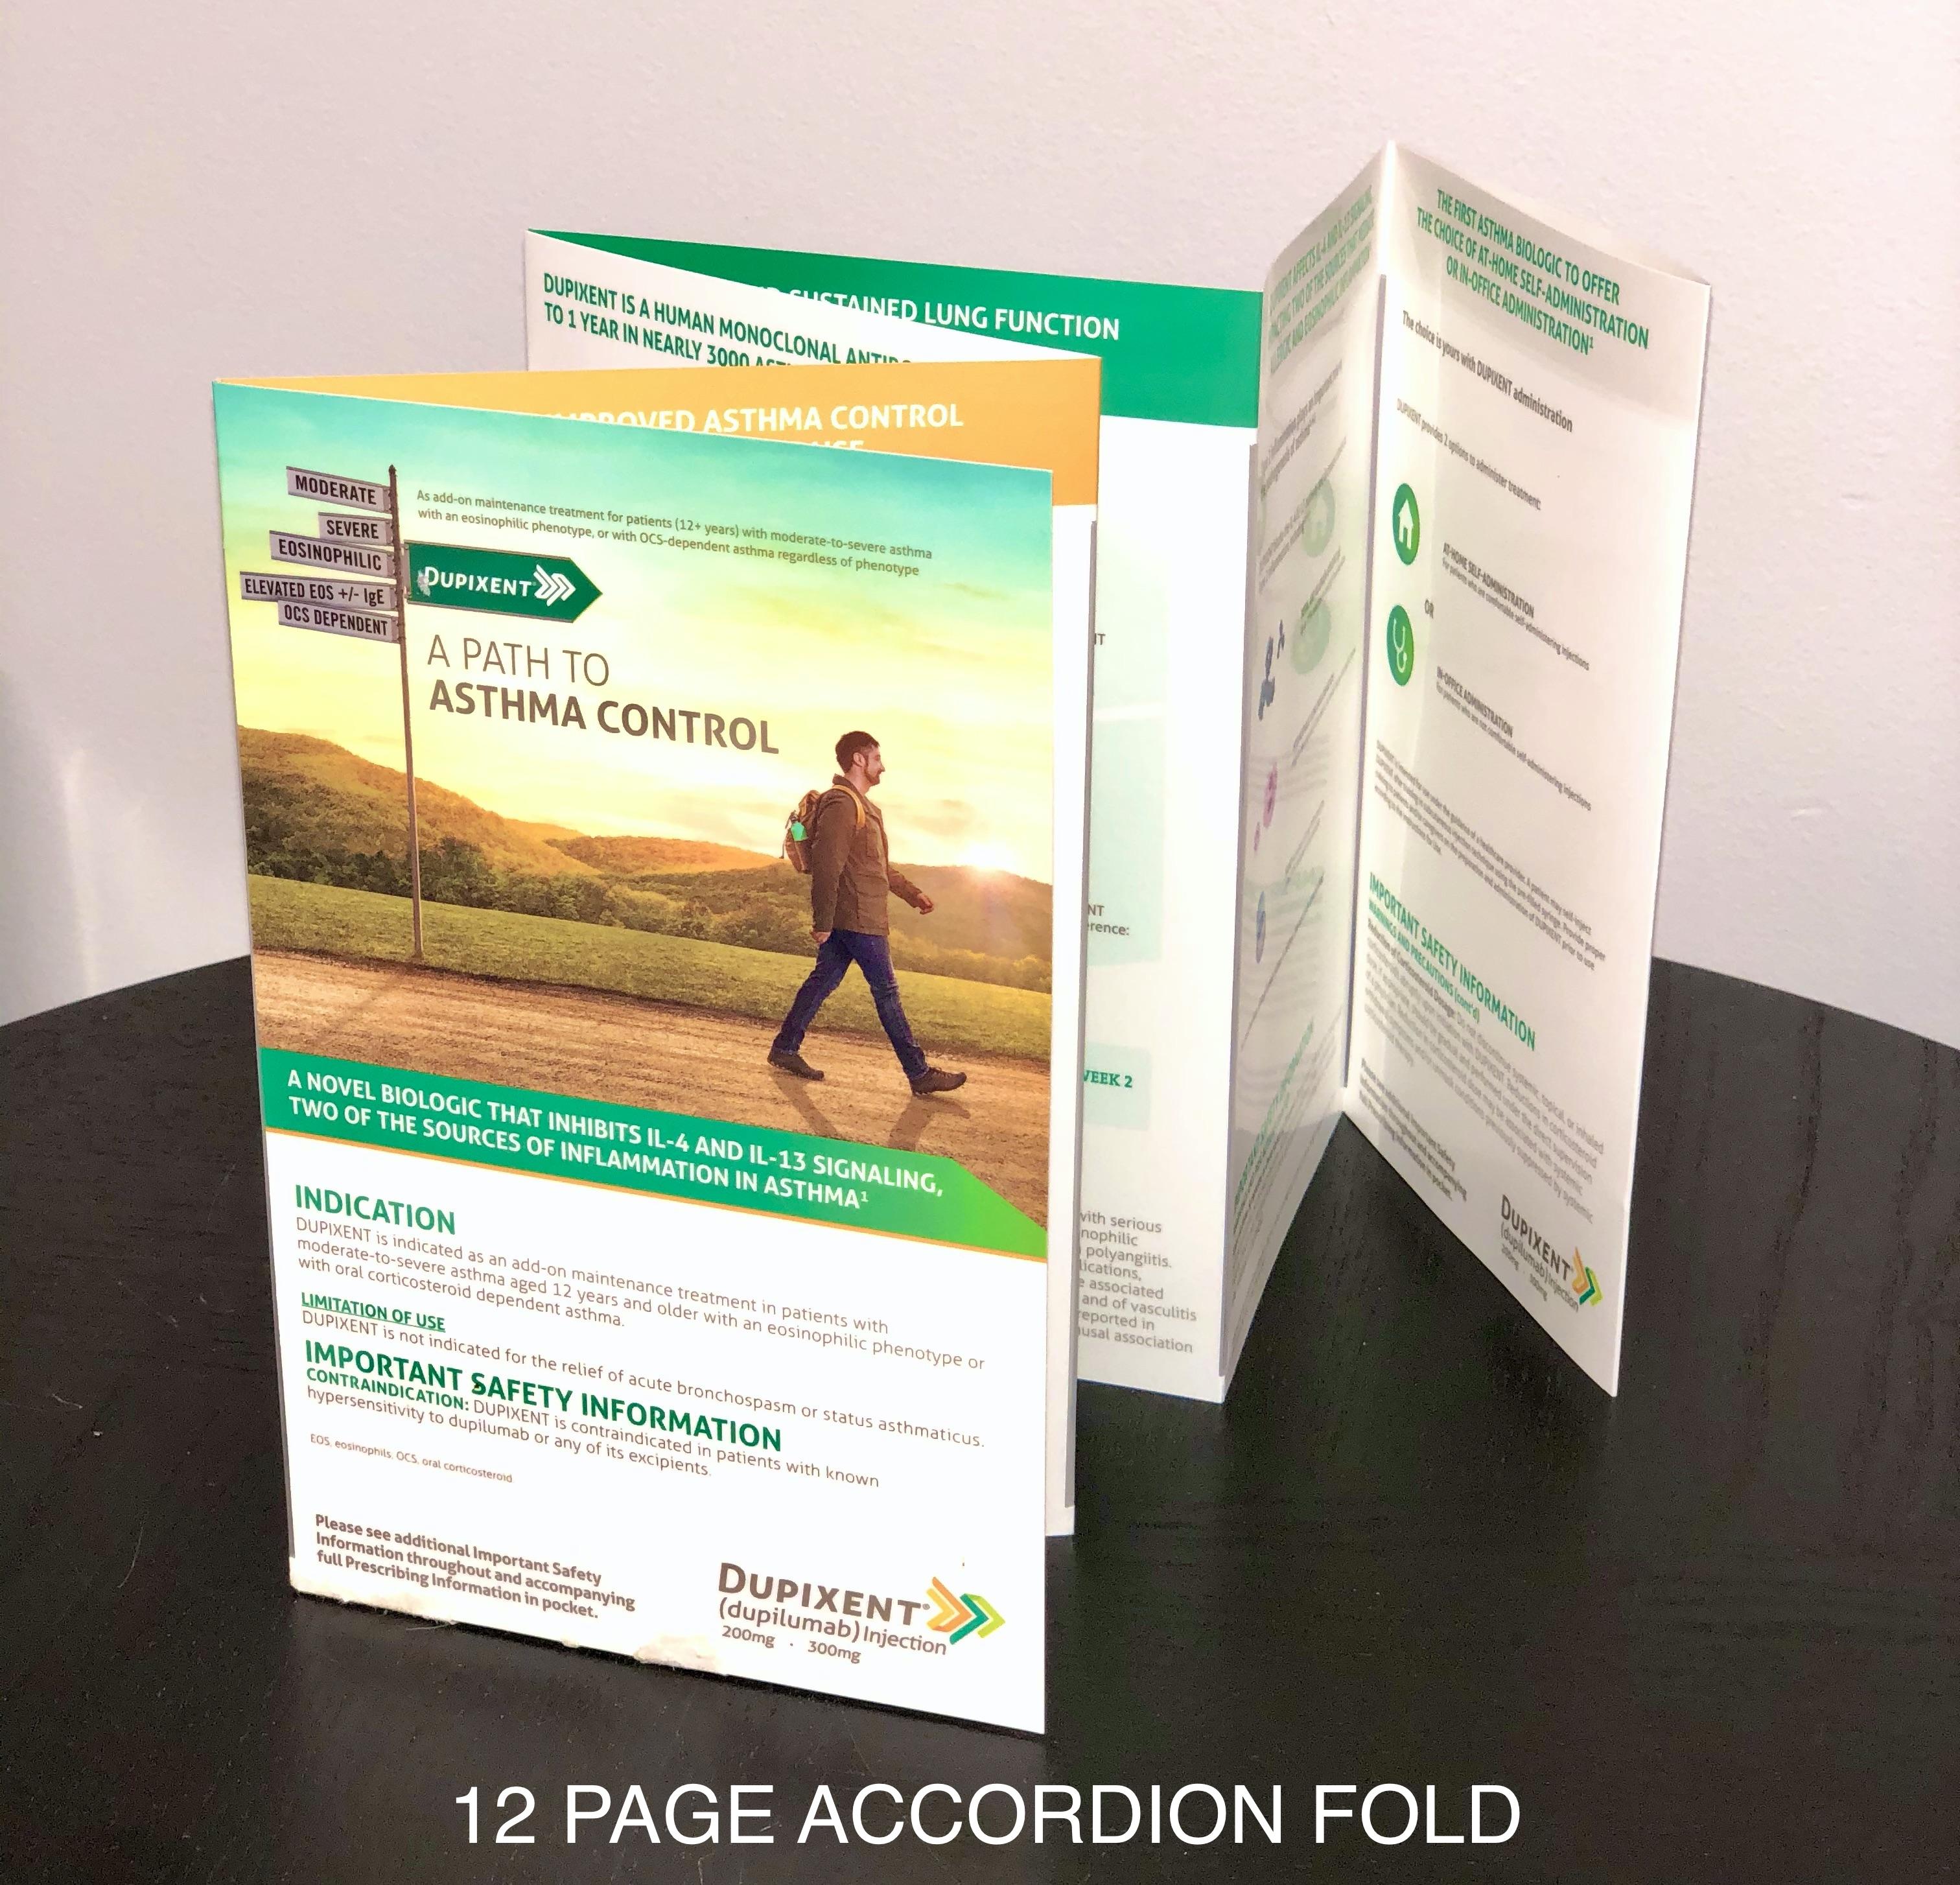 12 Panel Accordion Fold Brochure